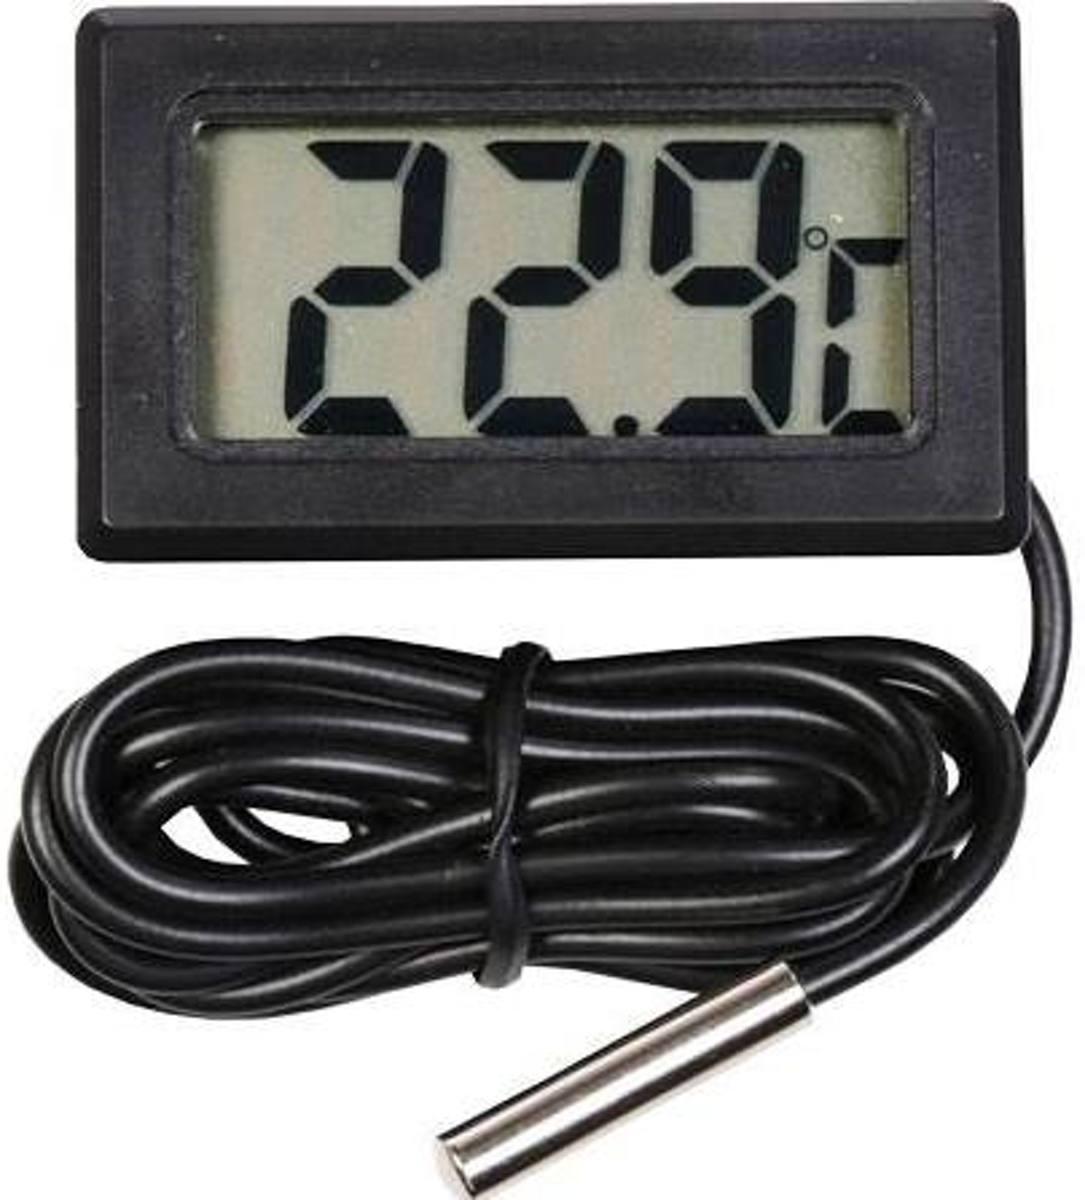 Vijver/zwembad Digitale thermometer + meetsonde -5ºC - +70ºC